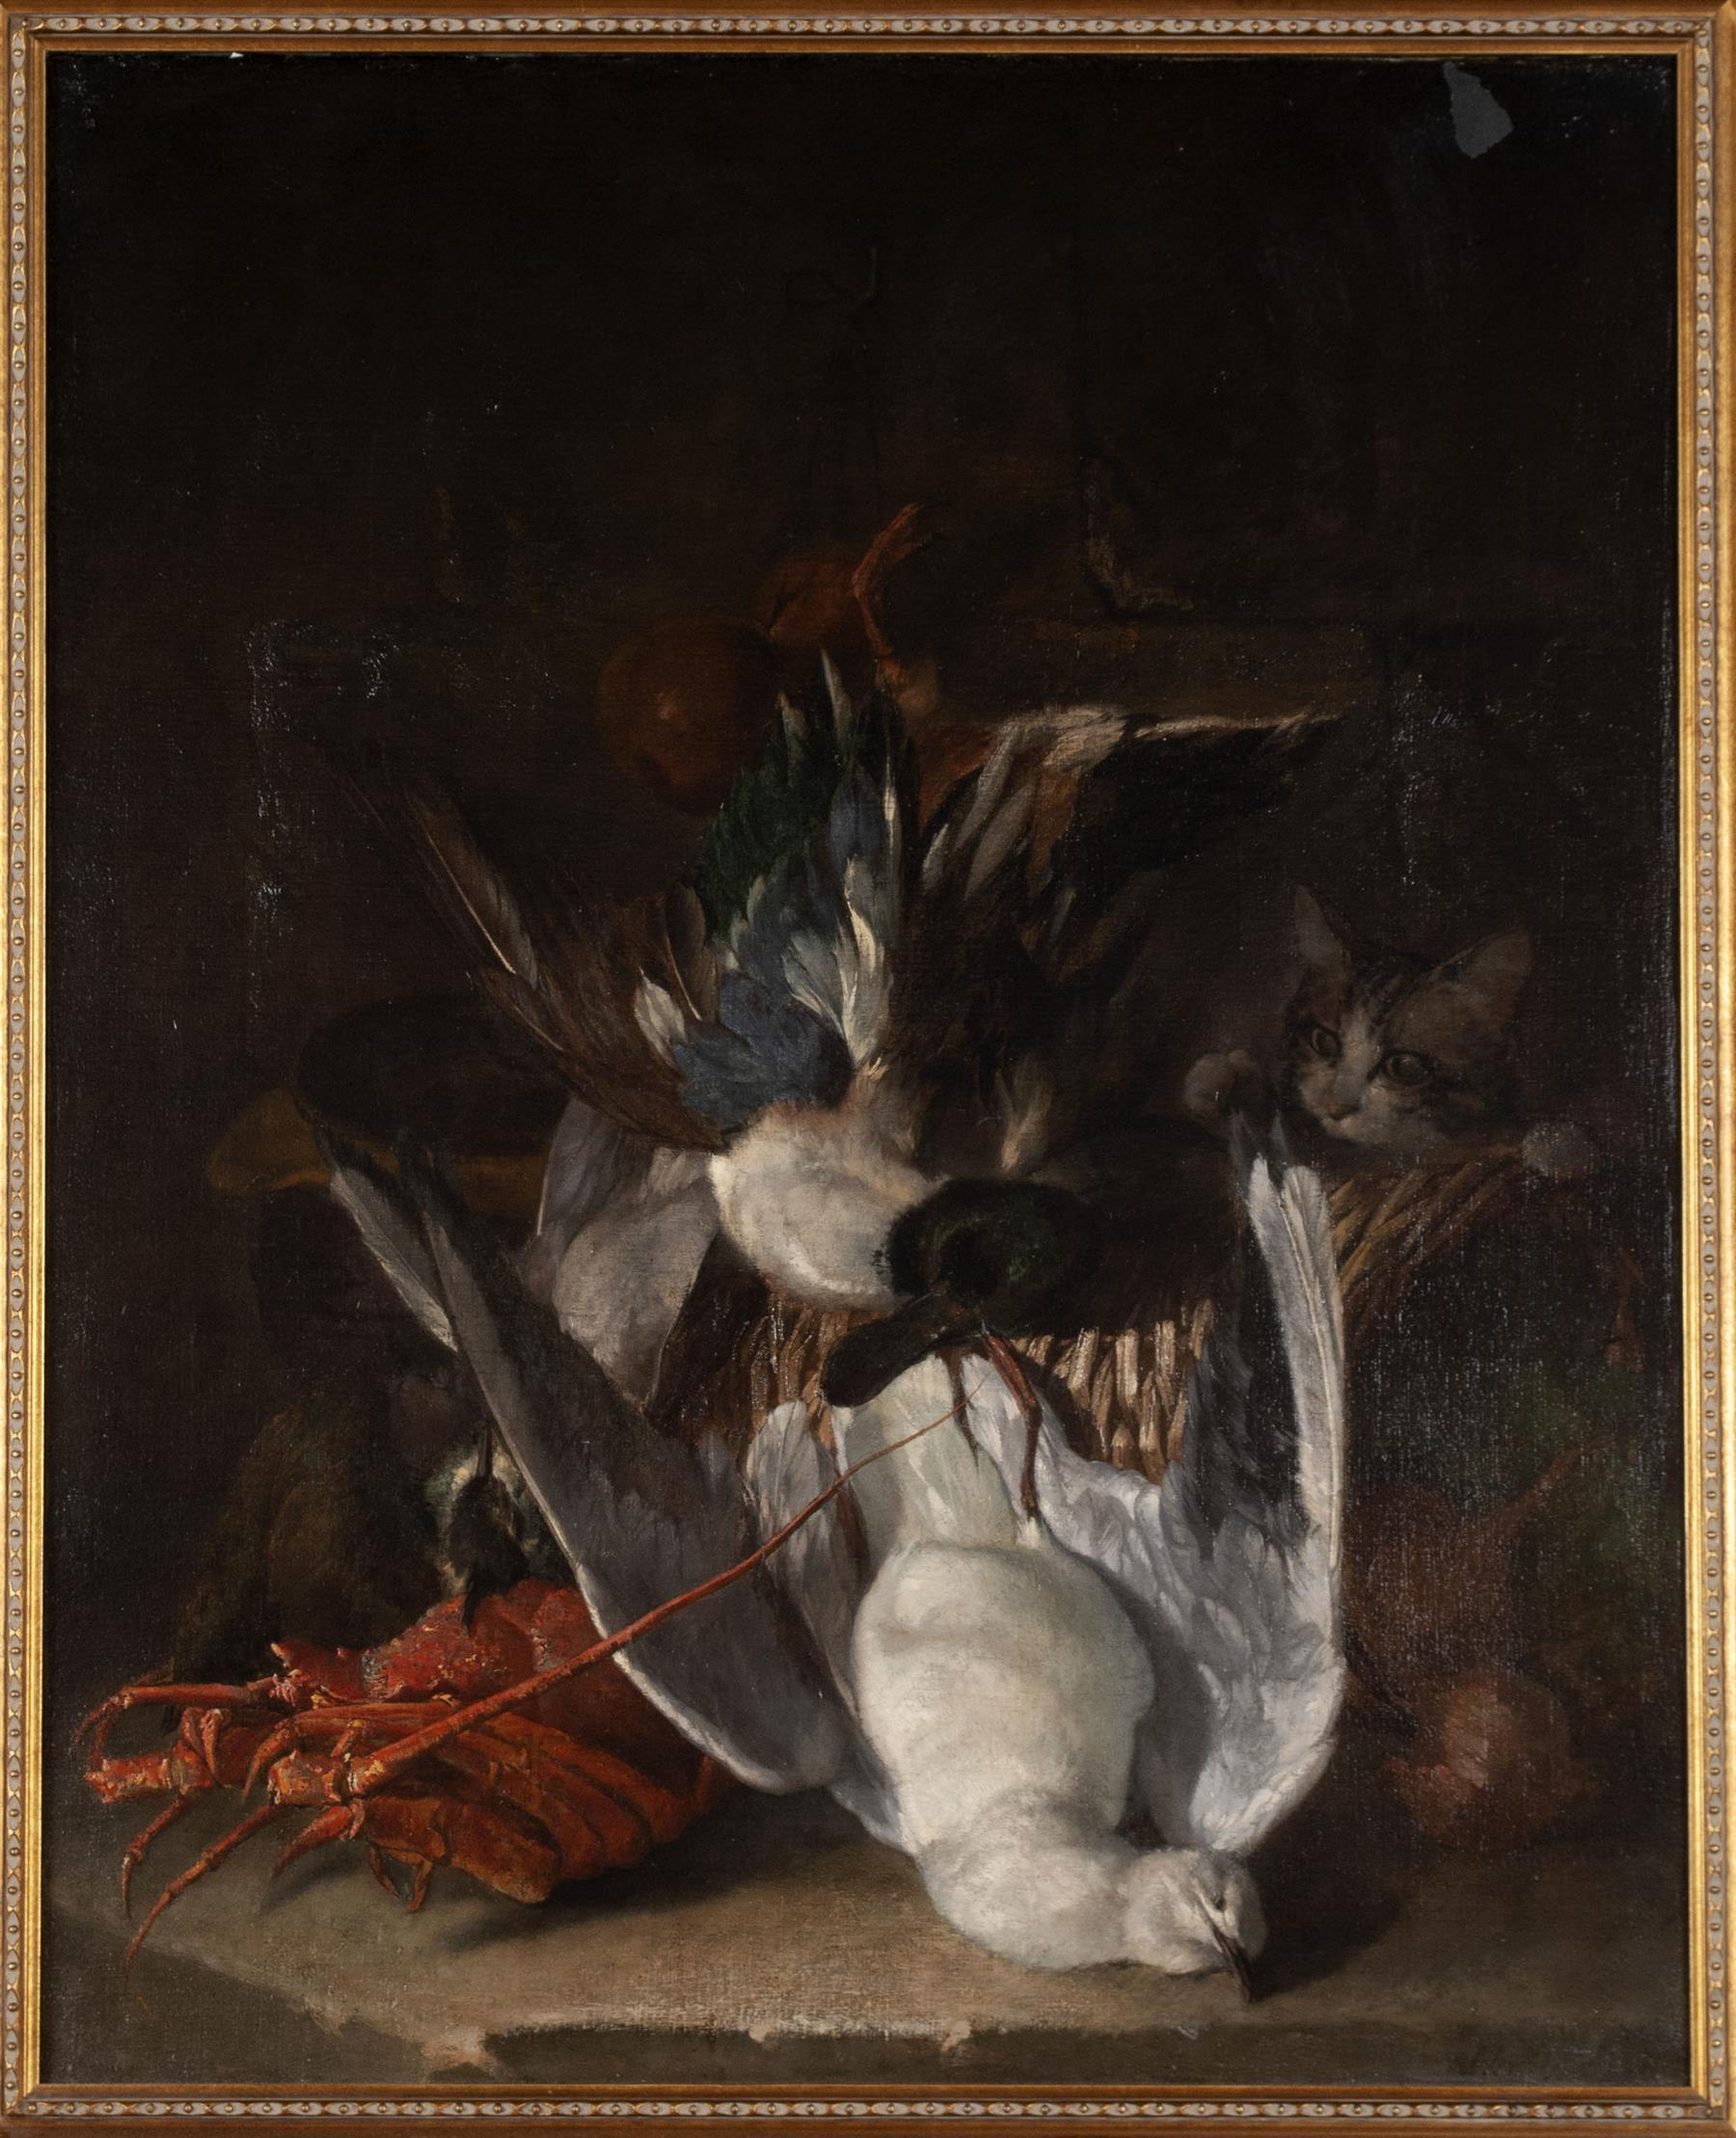 STILL LIFE IN THE MANNER OF STEPHEN ELMER (ENGLISH, 1717-1796)